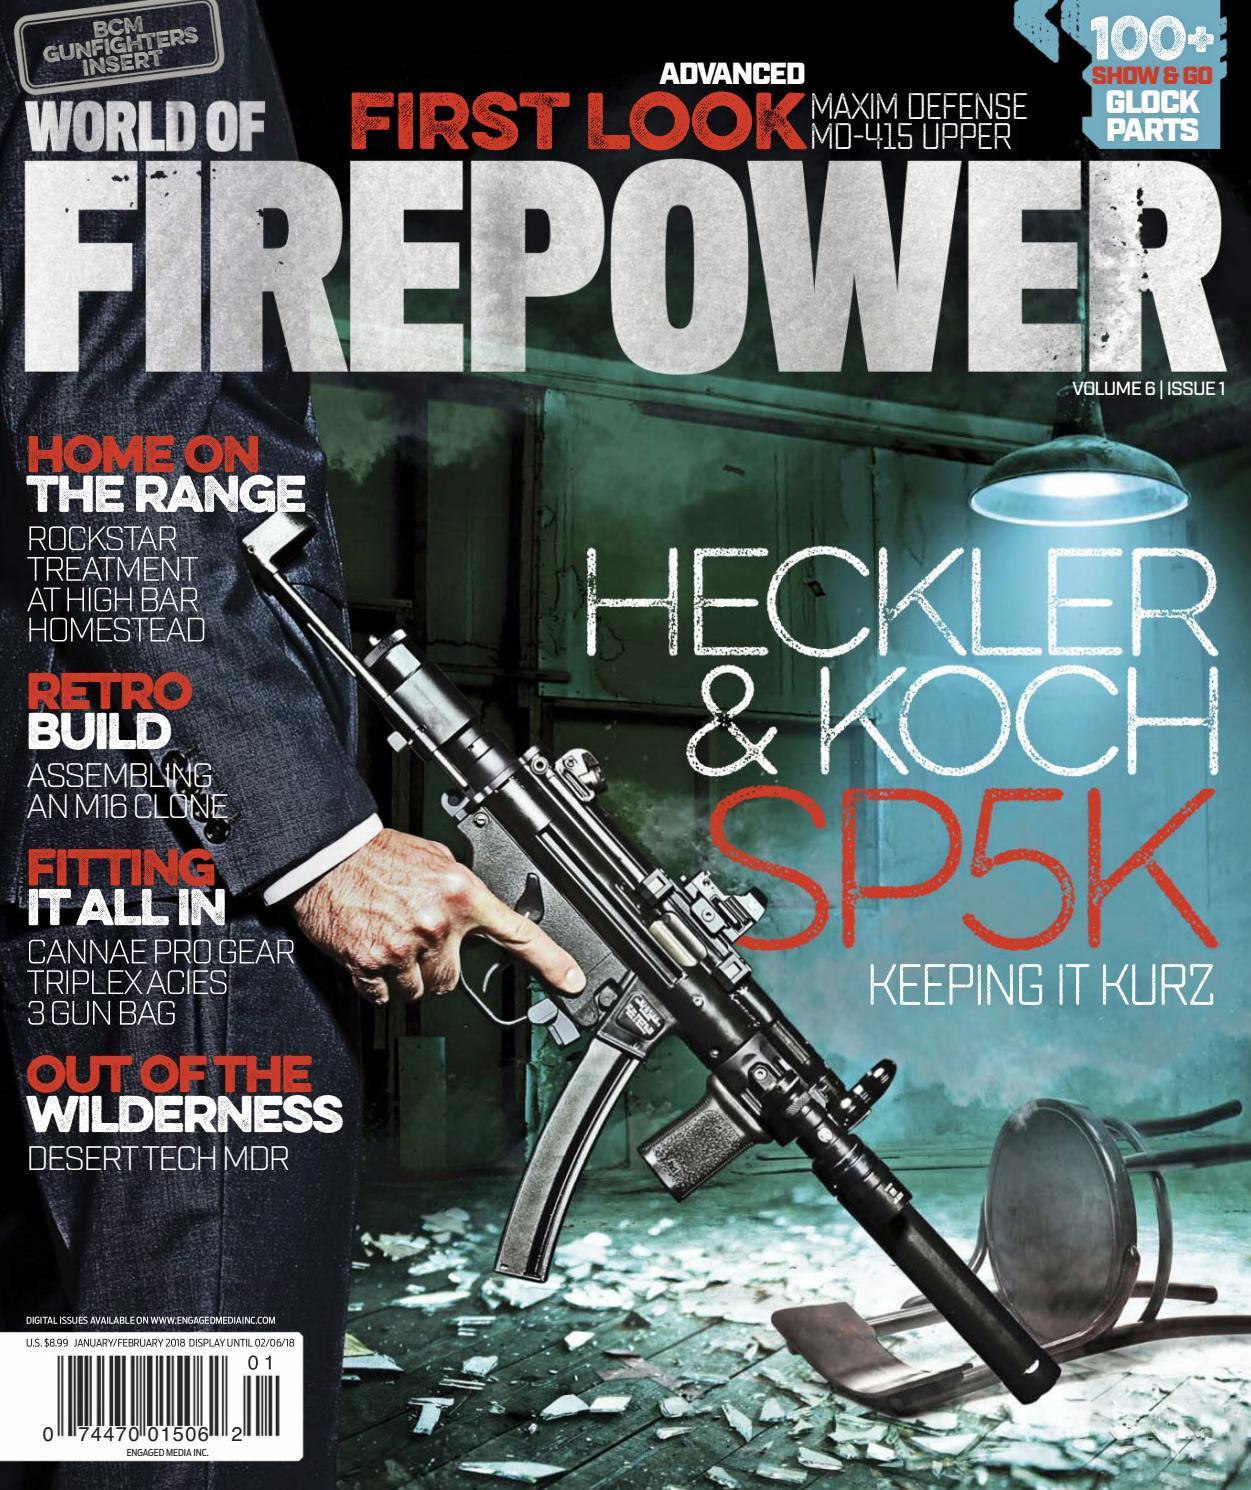 World of Firepower - January February 2018 by Vadim Koval